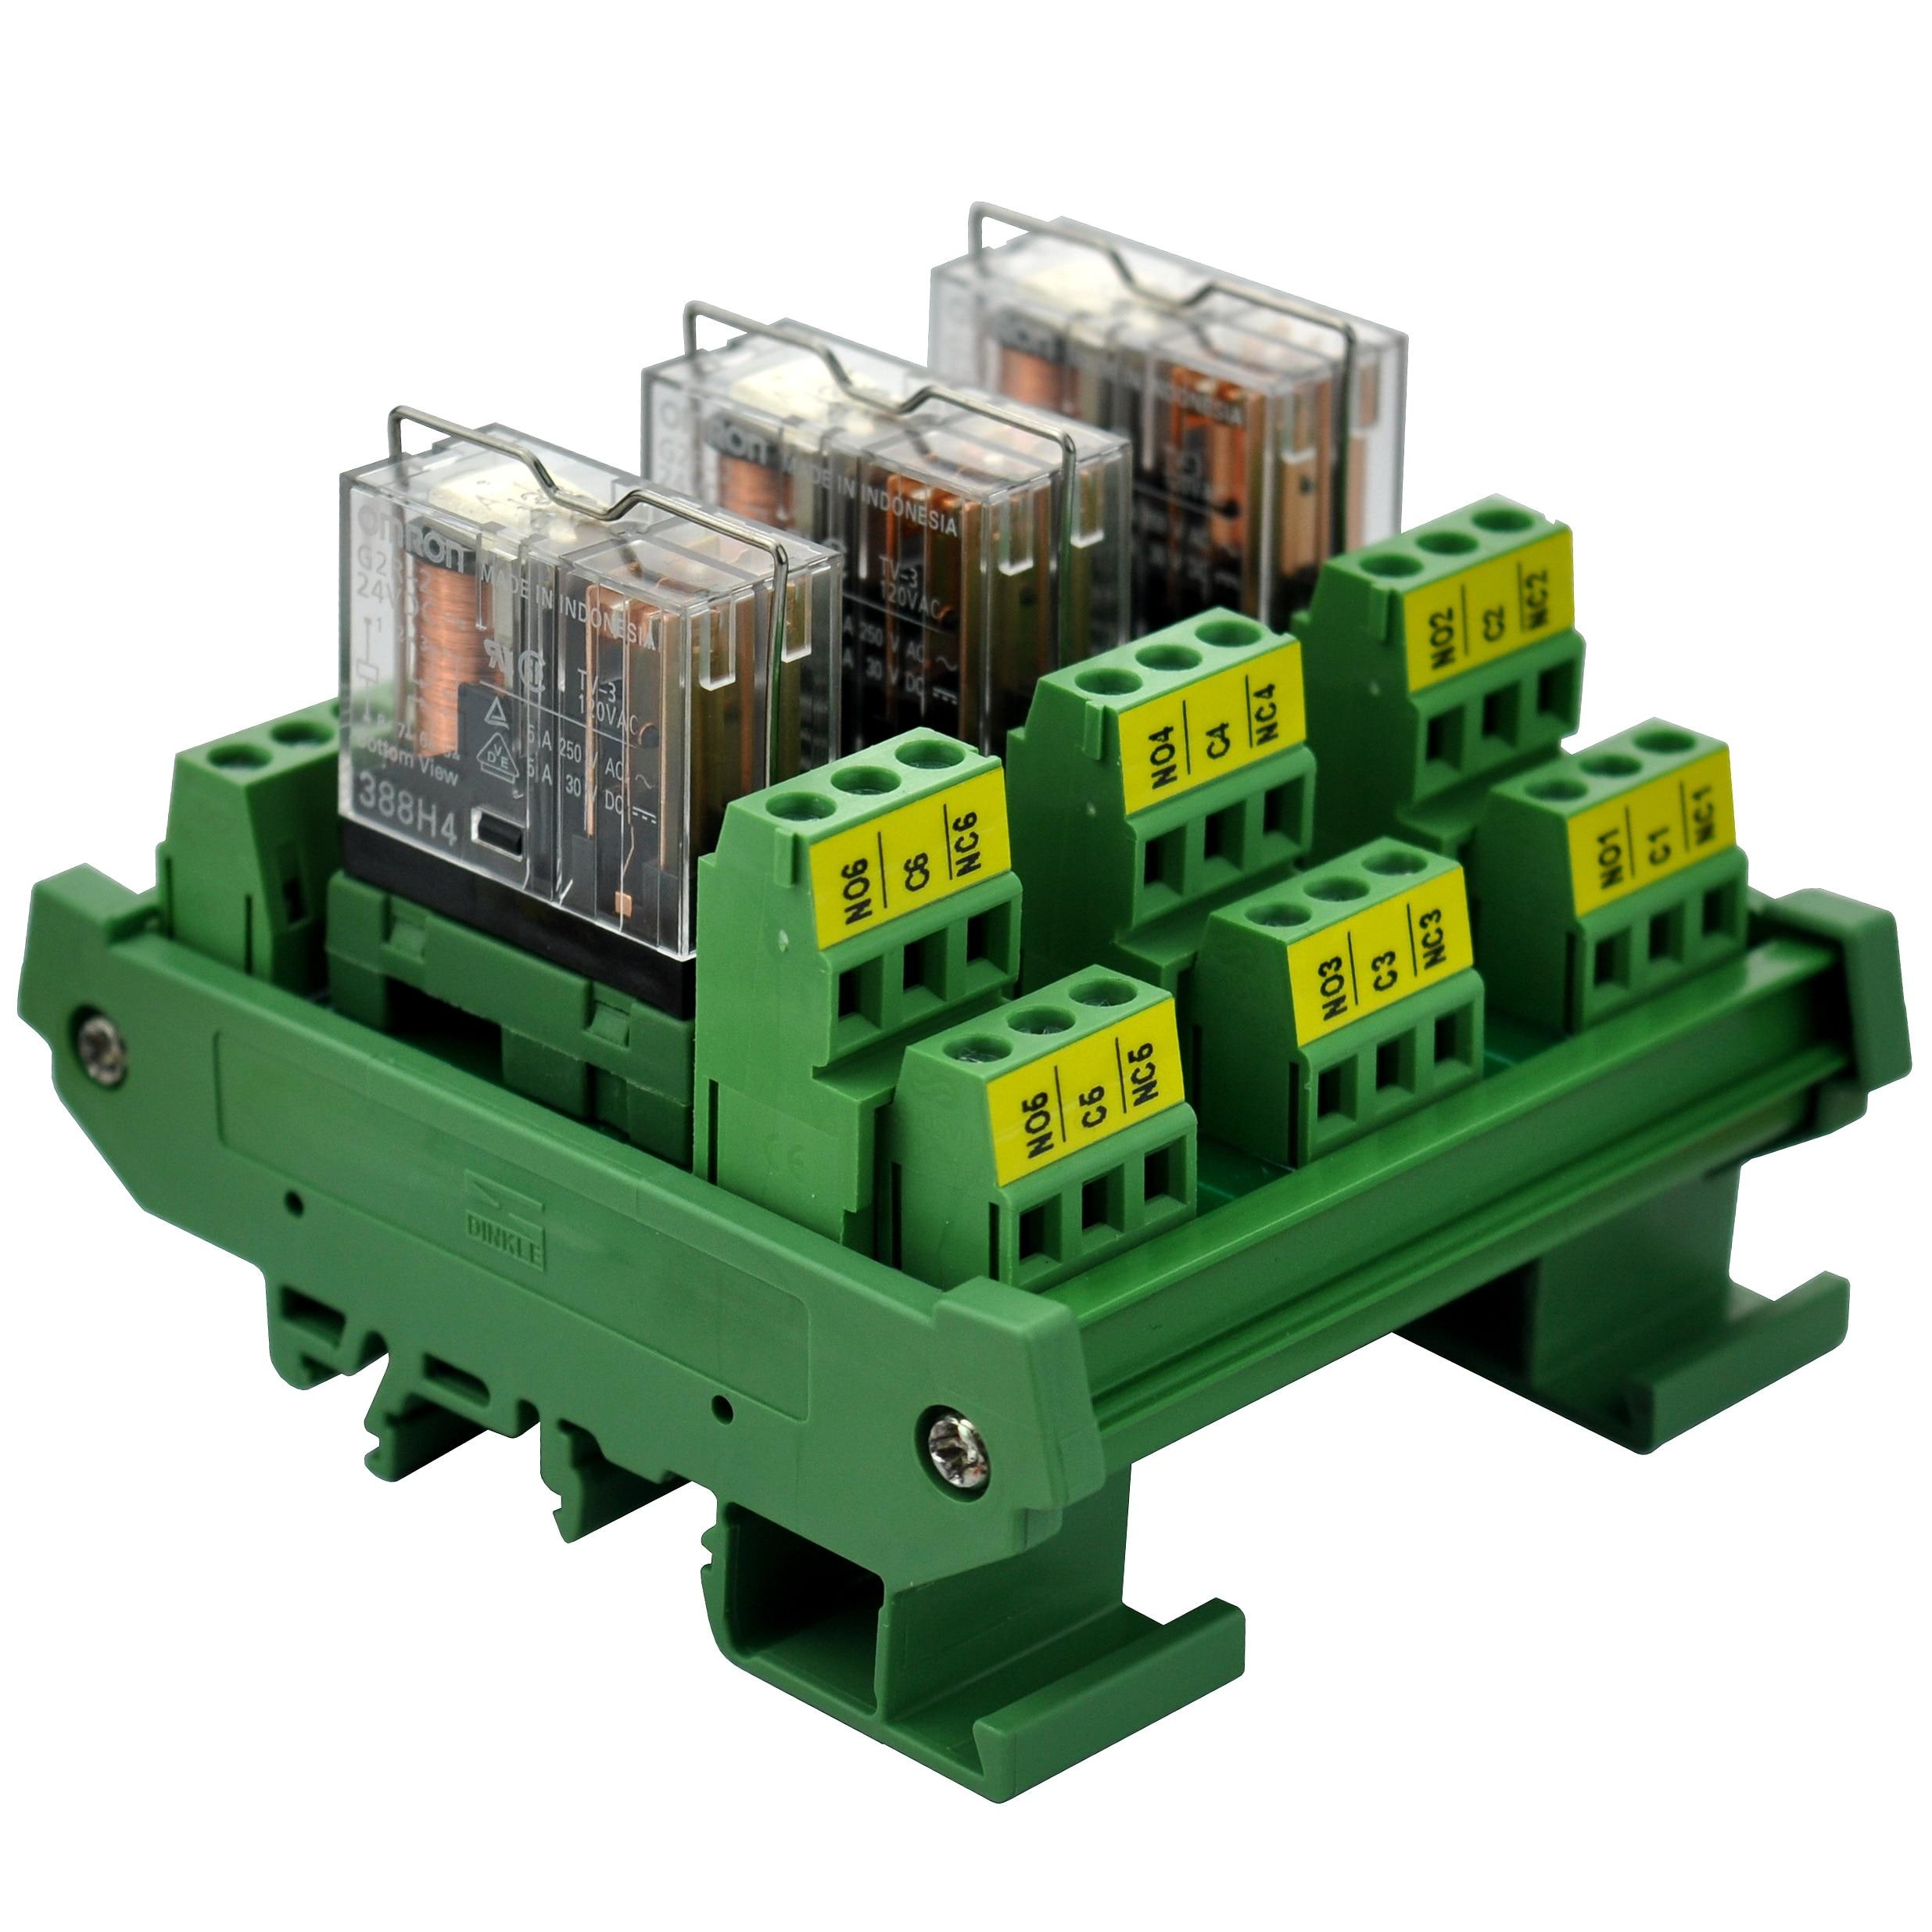 ELECTRONICS-SALON DIN Rail Mount AC/DC 24Control 3 DPDT 5Amp Pluggable Power Relay Interface Module.